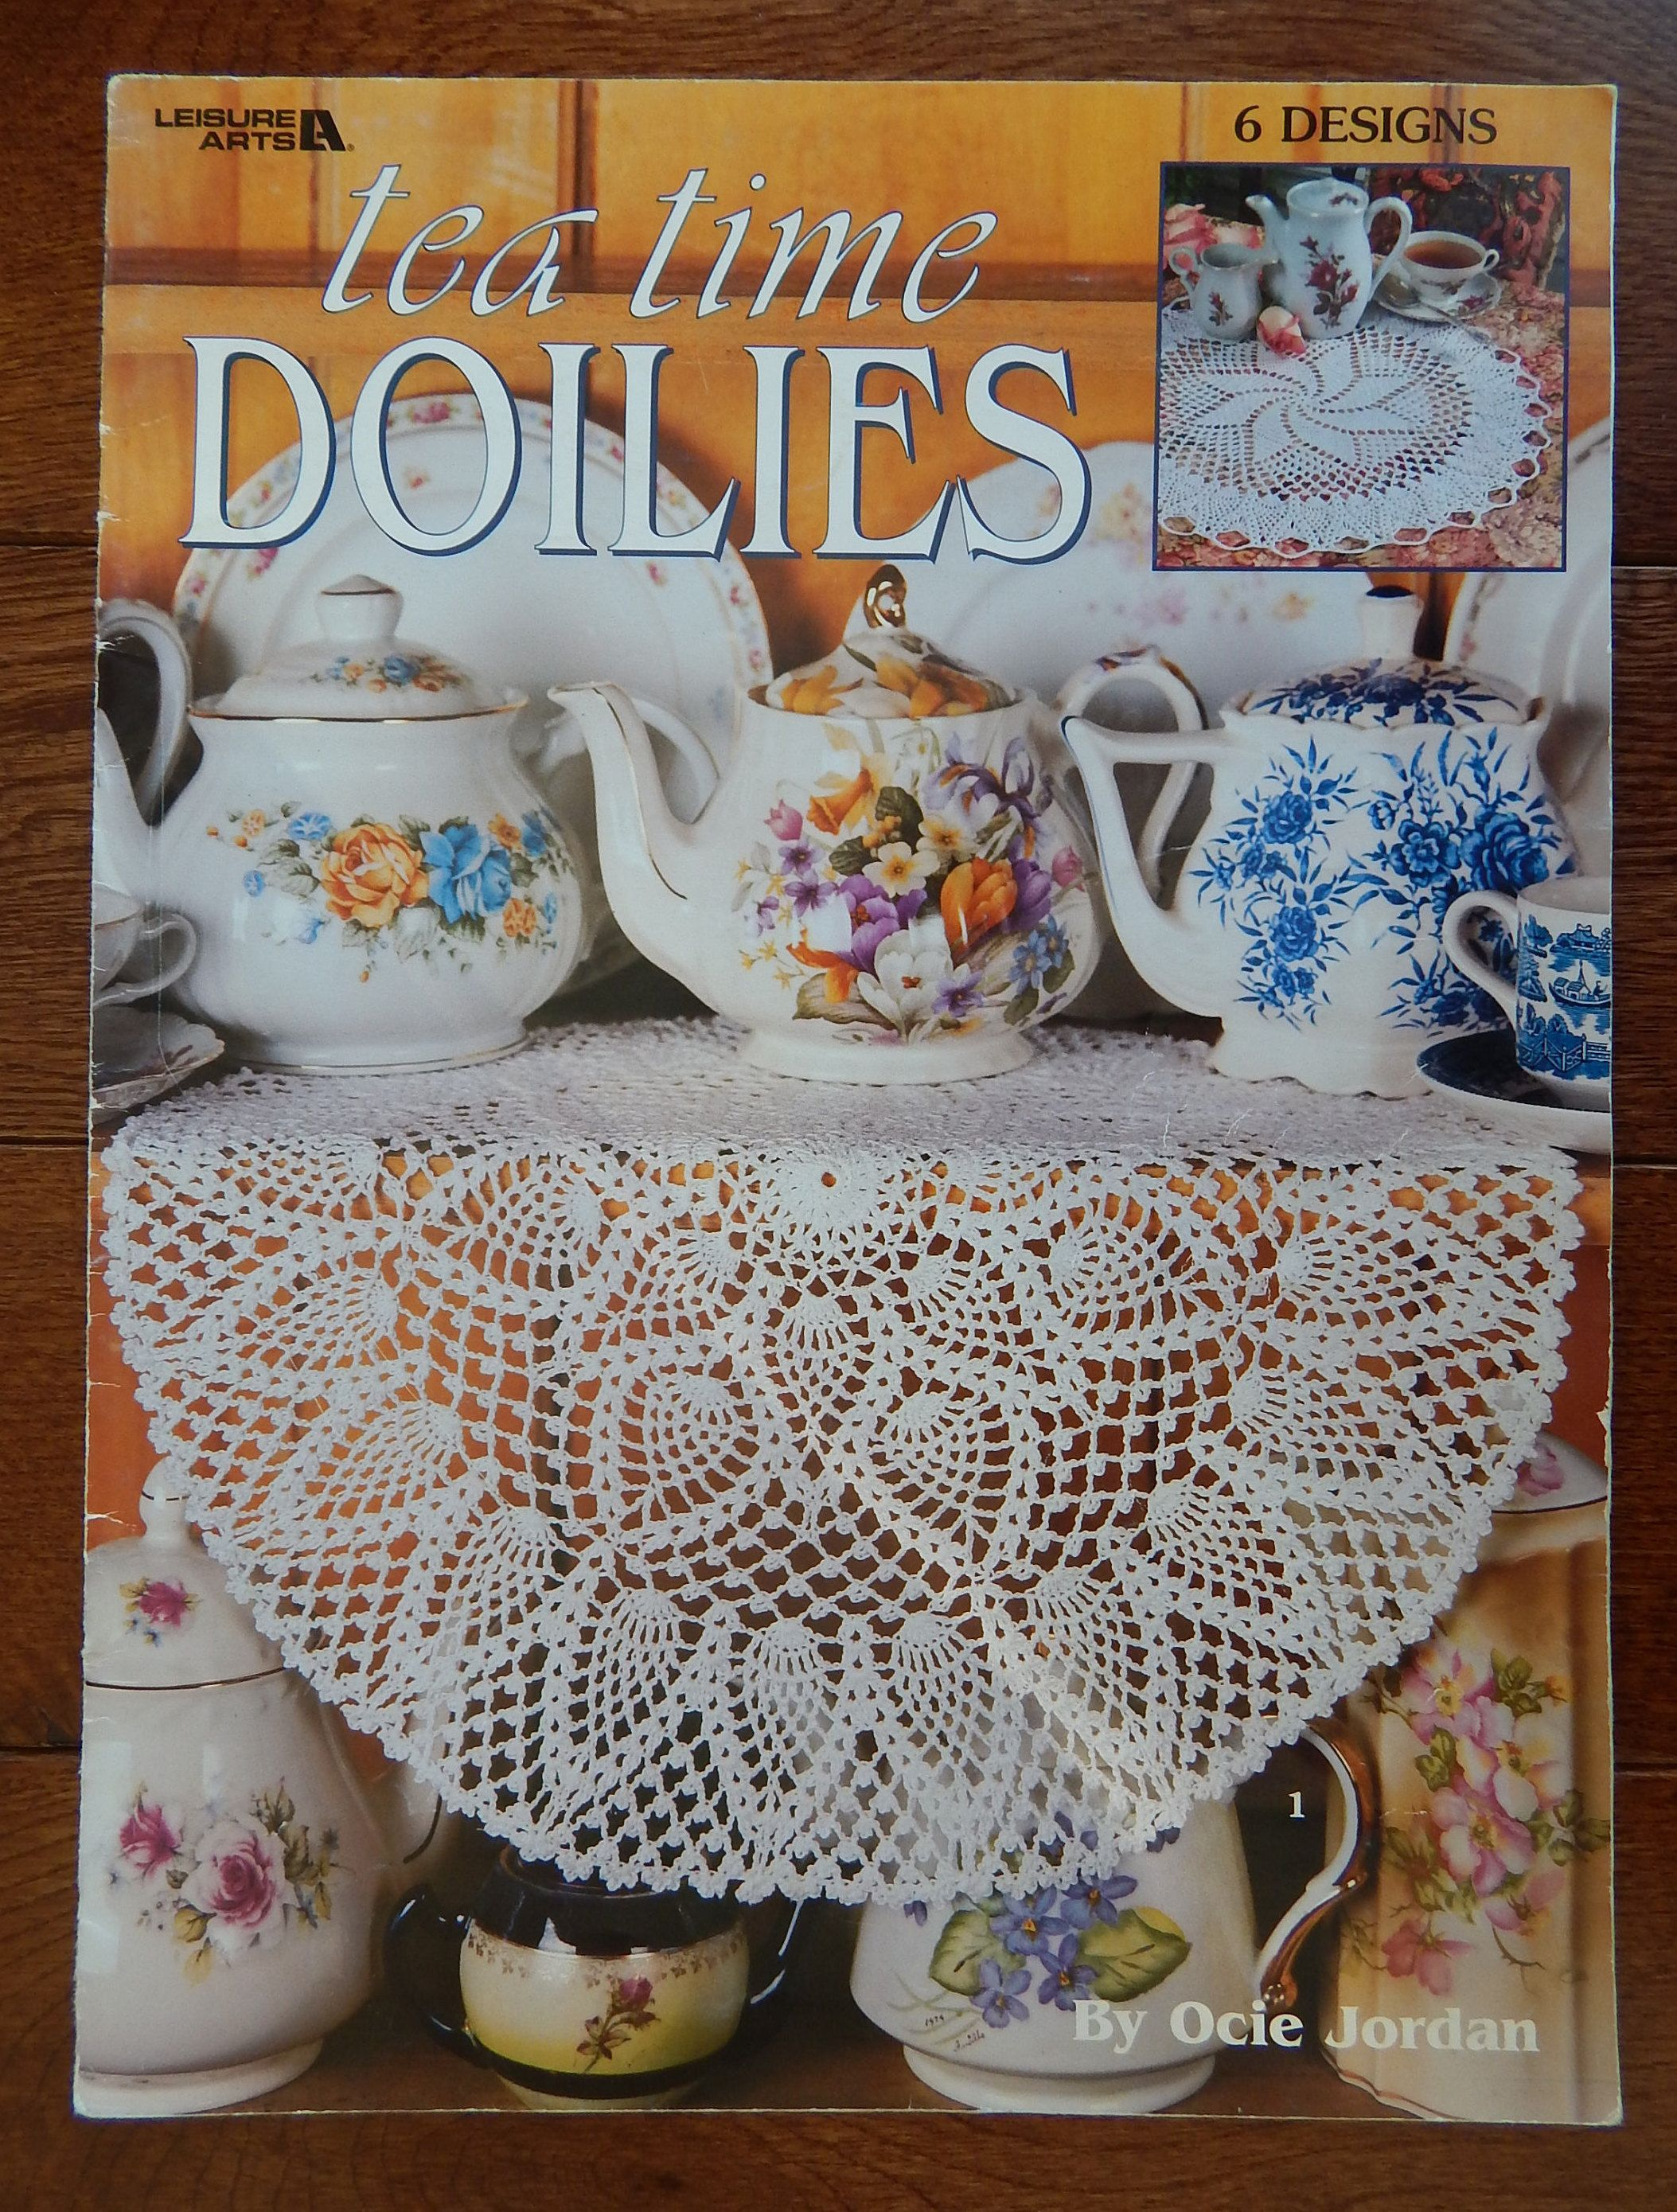 Crochet Pineapple Doily Patterns / Leisure Arts Tea Time Doilies, 6 ...